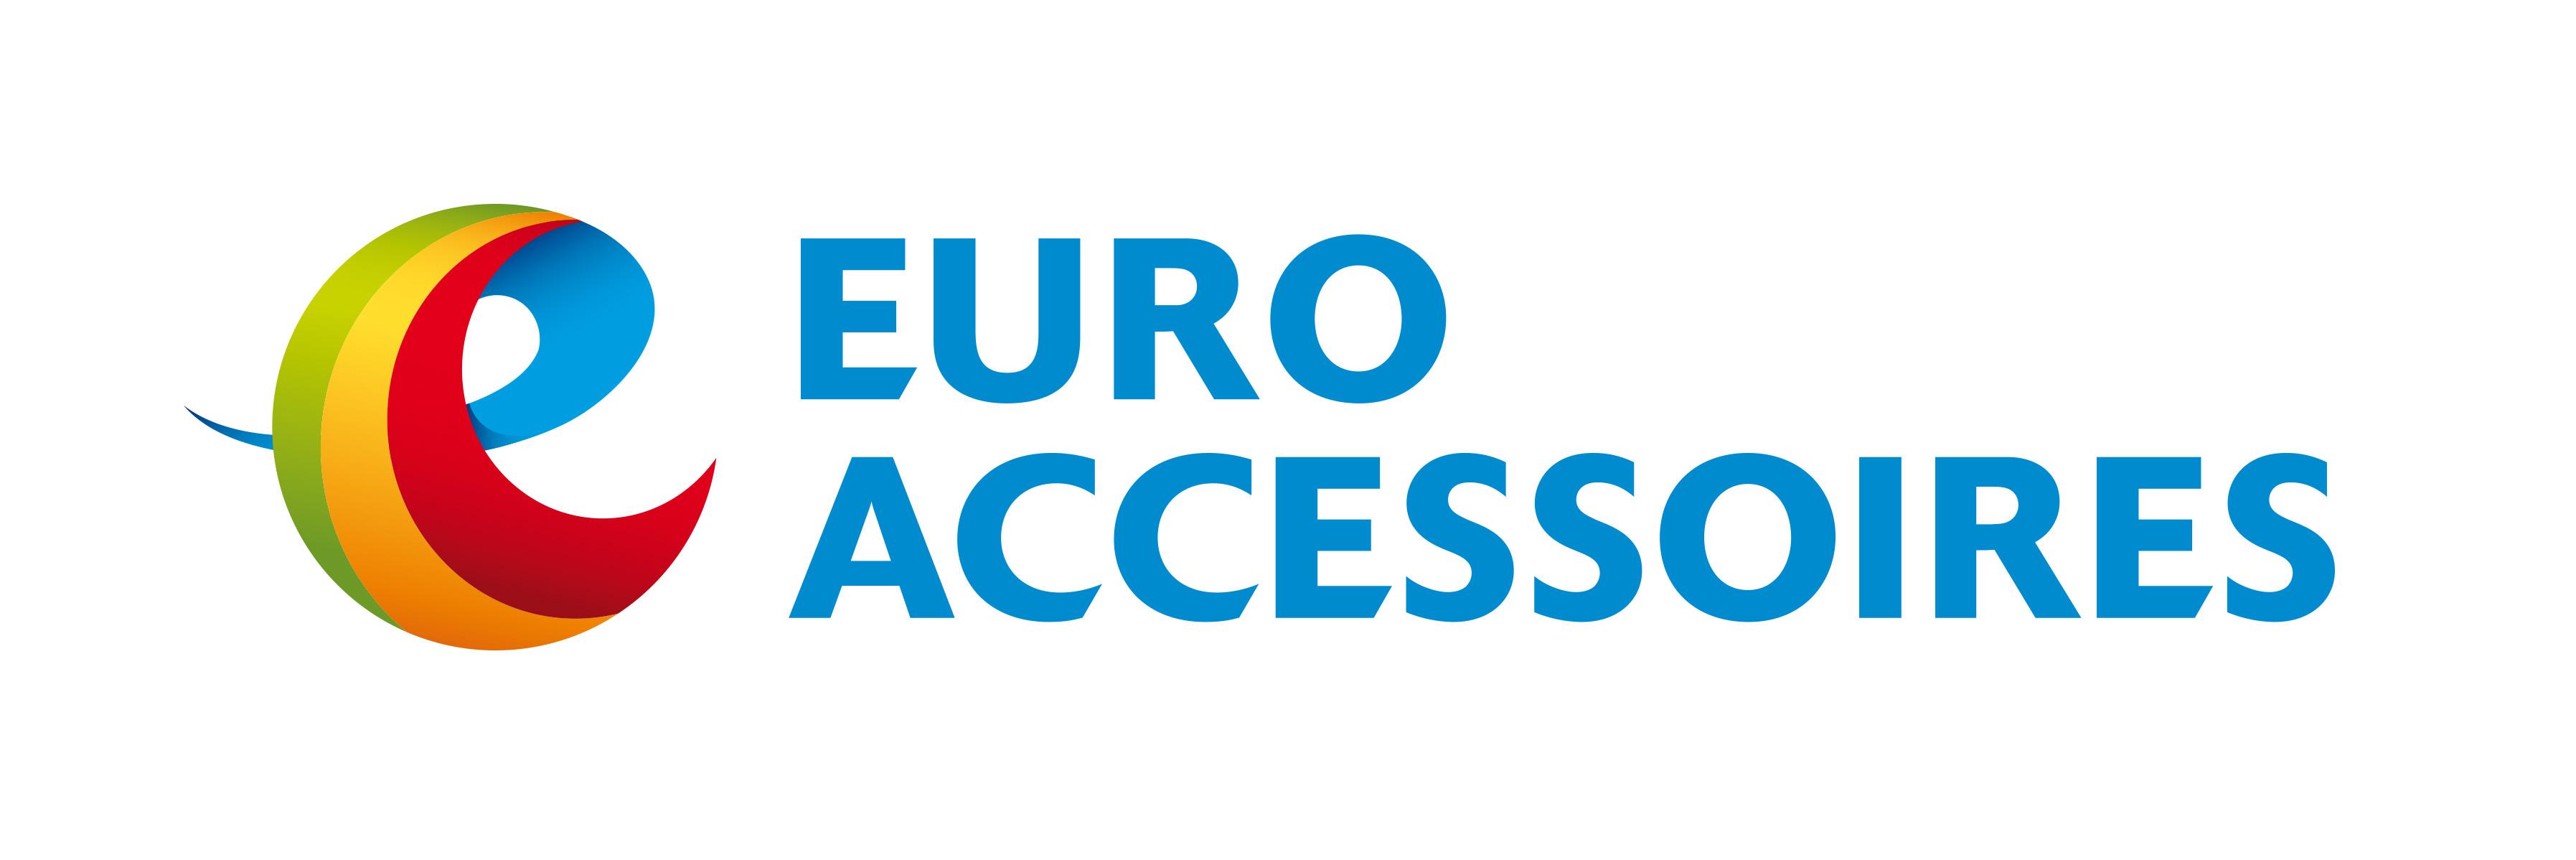 Euroaccessoiress - Tecnocamper